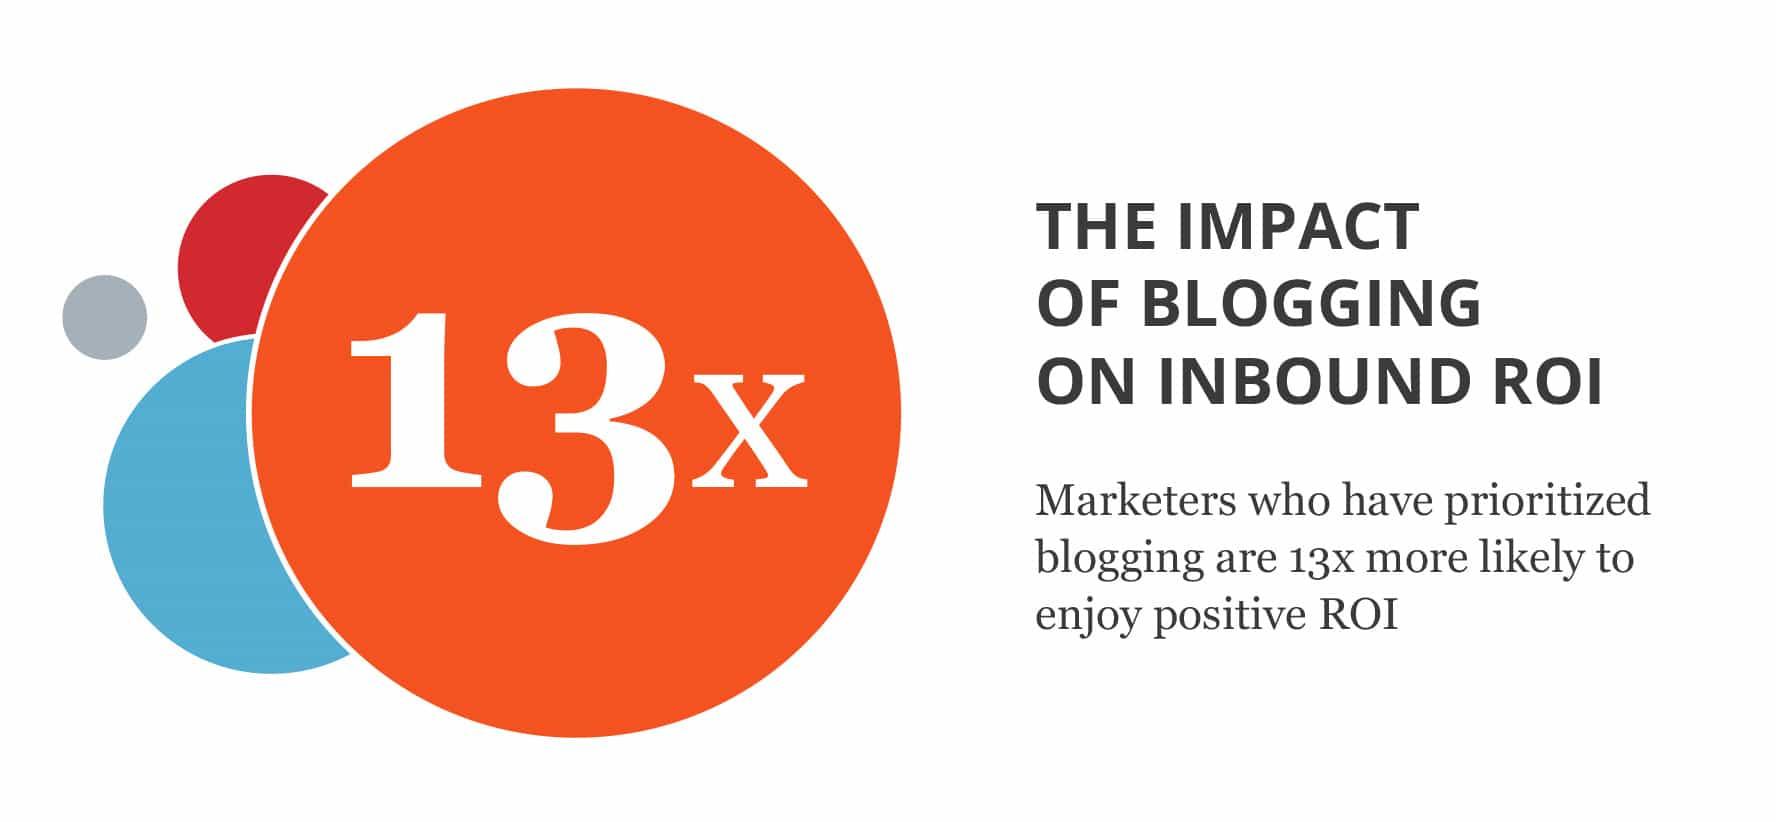 The Impact of Blogging on Inbound Marketing ROI